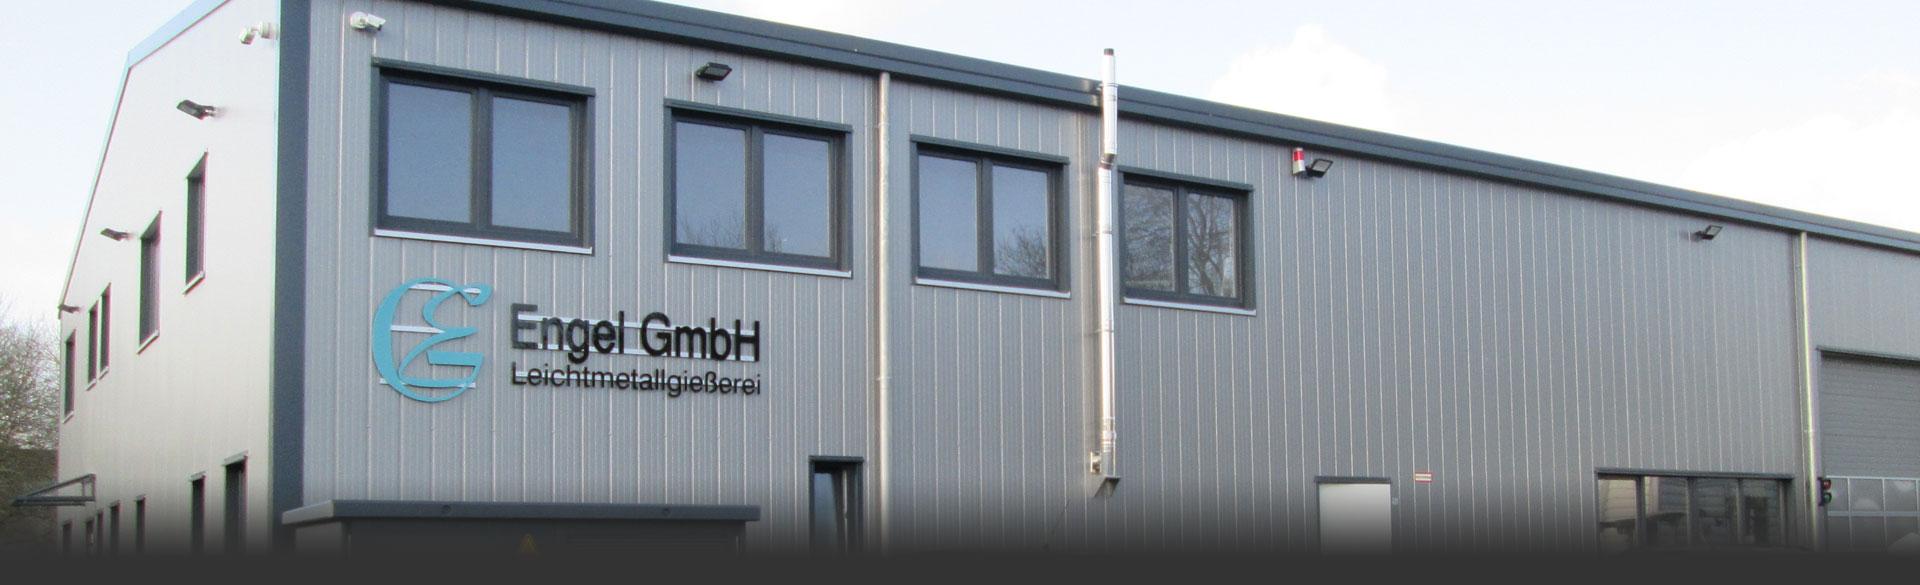 header Engel GmbH Neuenrade